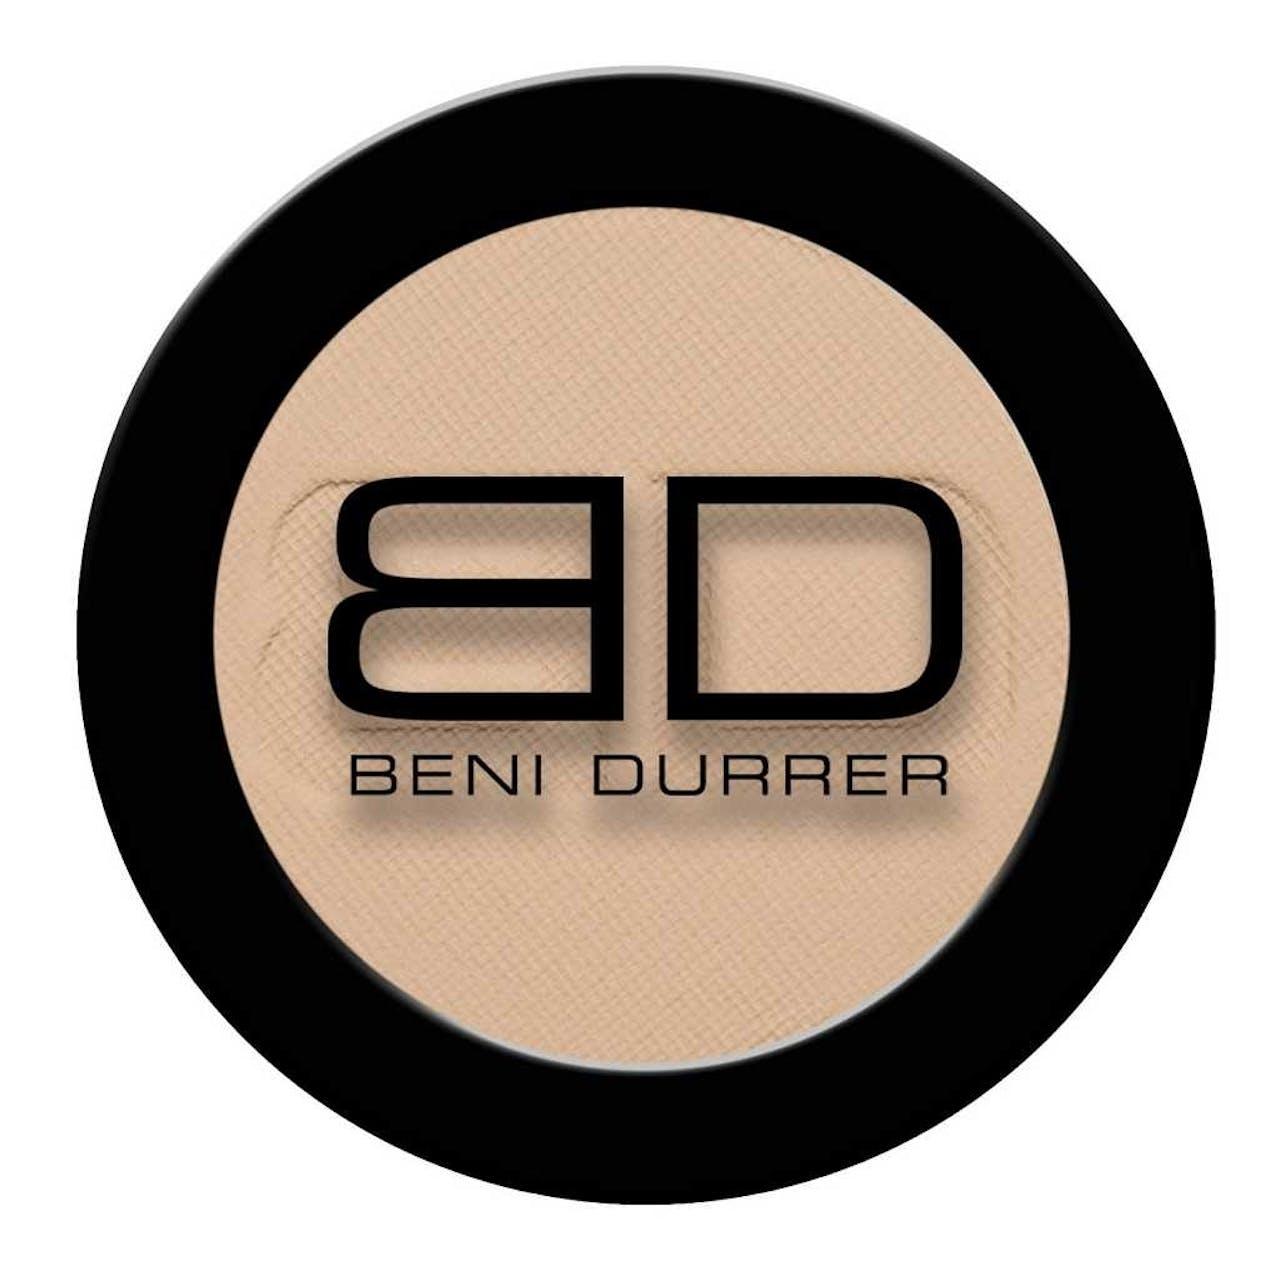 Beni Durrer Puderpigment Senf Refill - 2.5g - 5.40€/1g